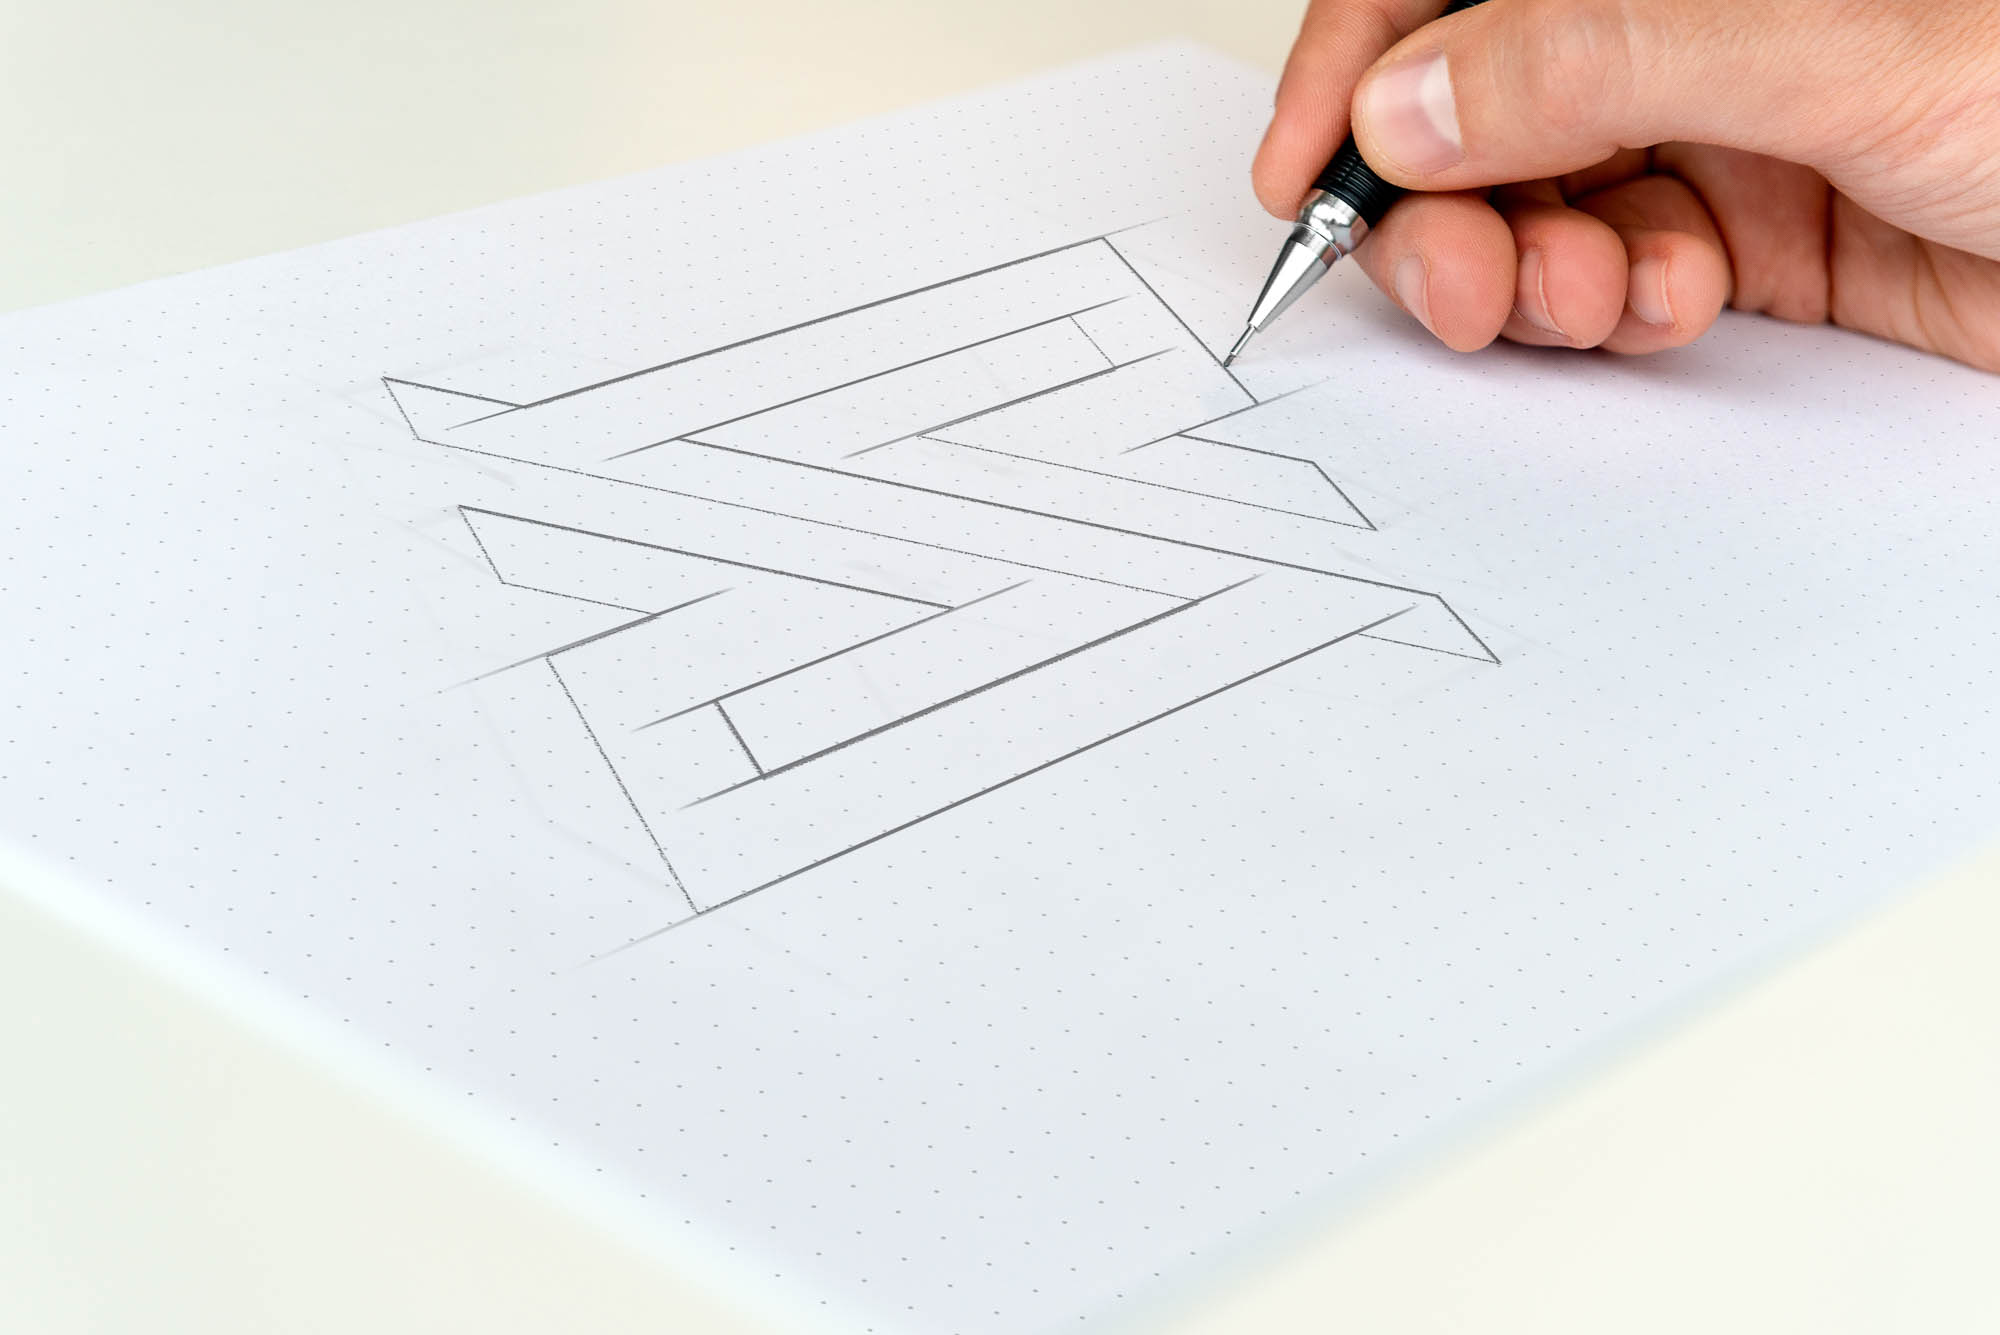 Royal Five - Logo MockUp - Sketch 1